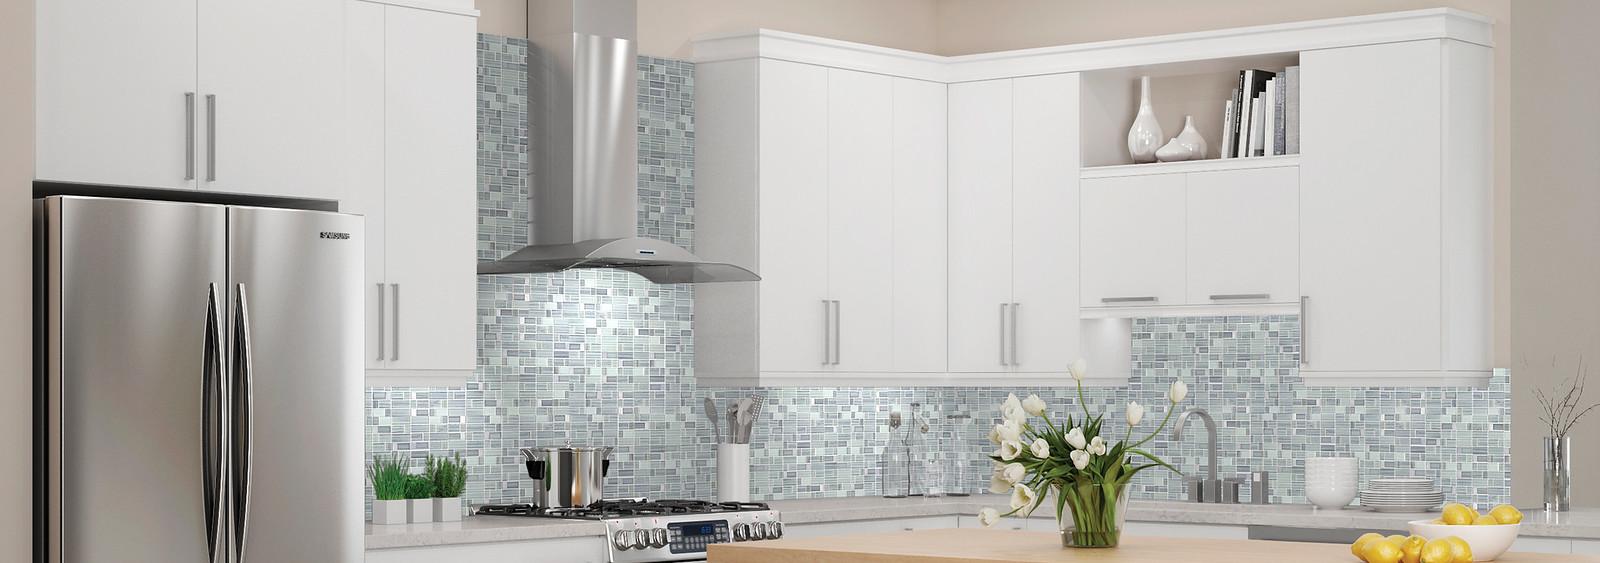 - Accent Tile Backsplash - Kitchen & Bath Building And Design